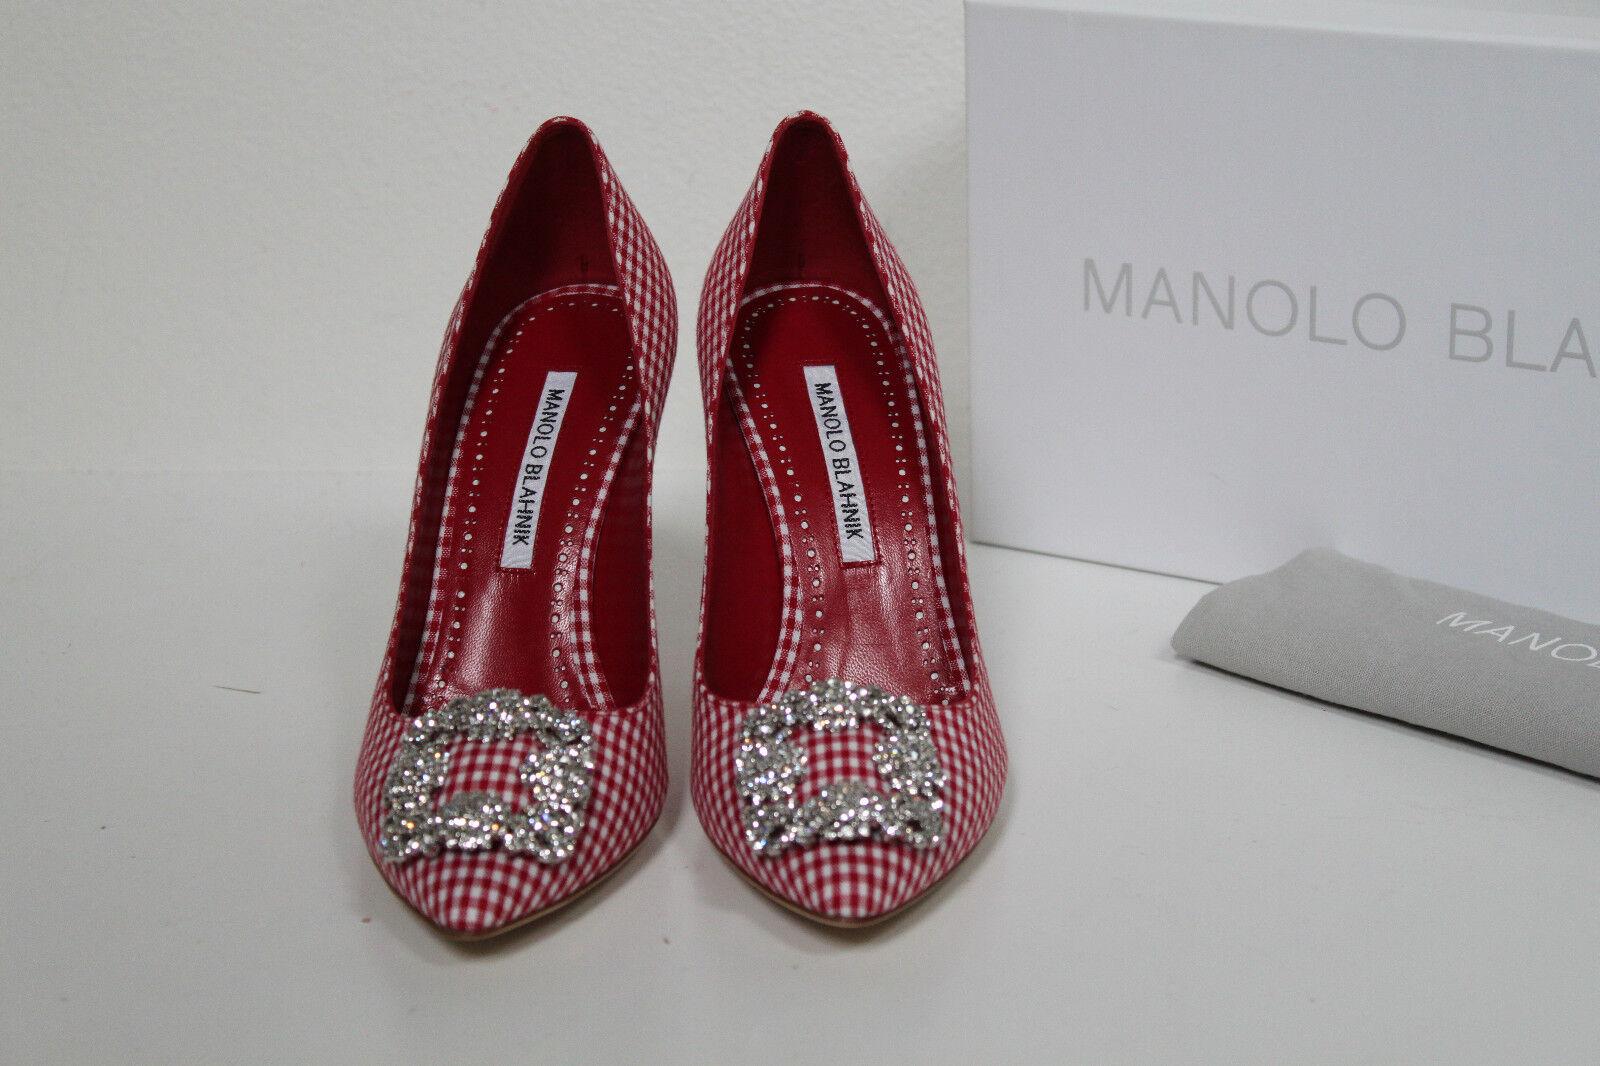 Sz 9   39 Manolo Blahnik Hangisi Gingham Crystal Brooch Jewel Pump shoes